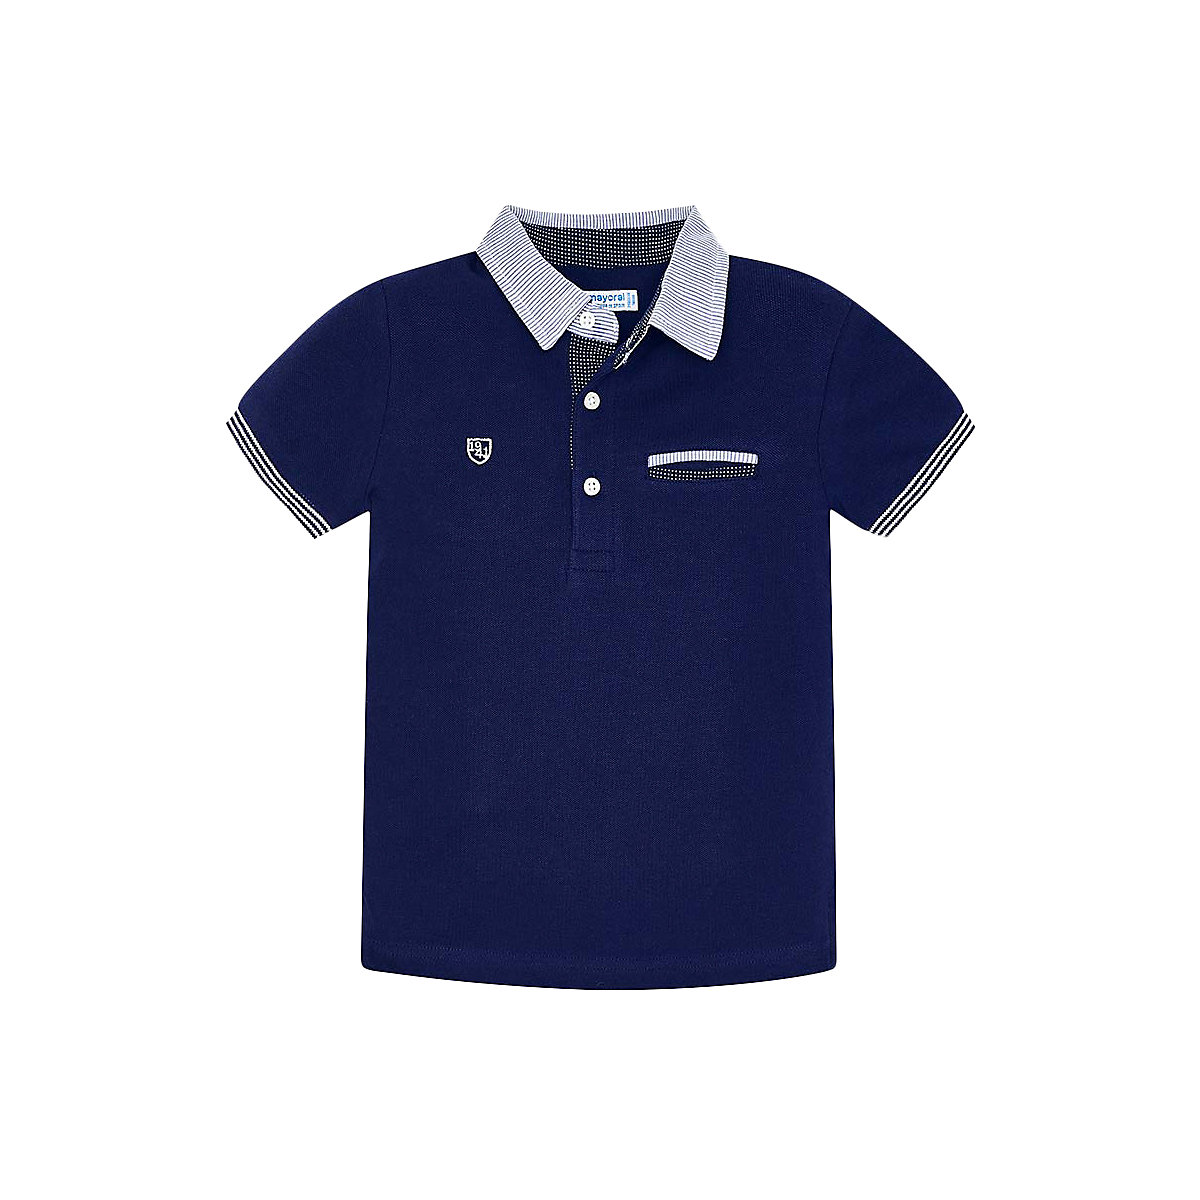 MAYORAL Polo Shirts 10691679 Children Clothing T-shirt Shirt The Print For Boys